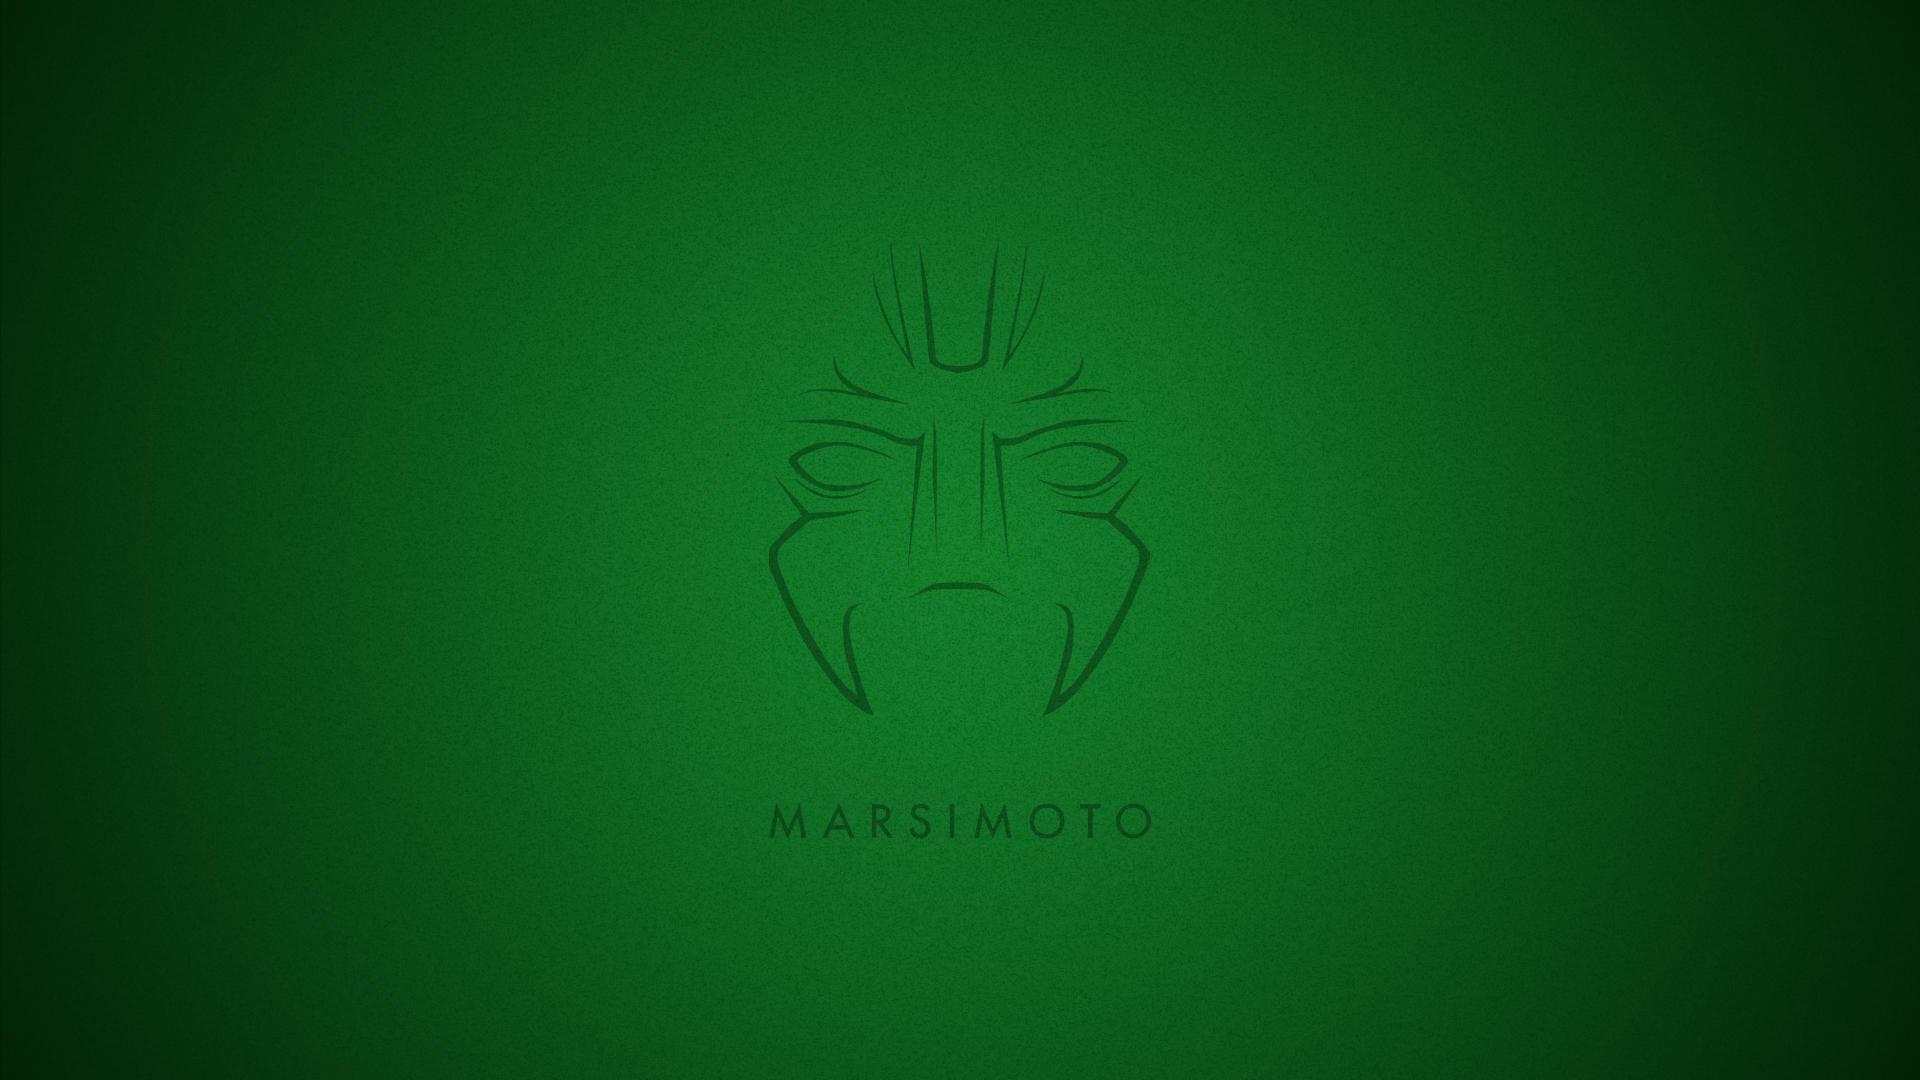 marsimoto mask wallpaper by cchesk on deviantart